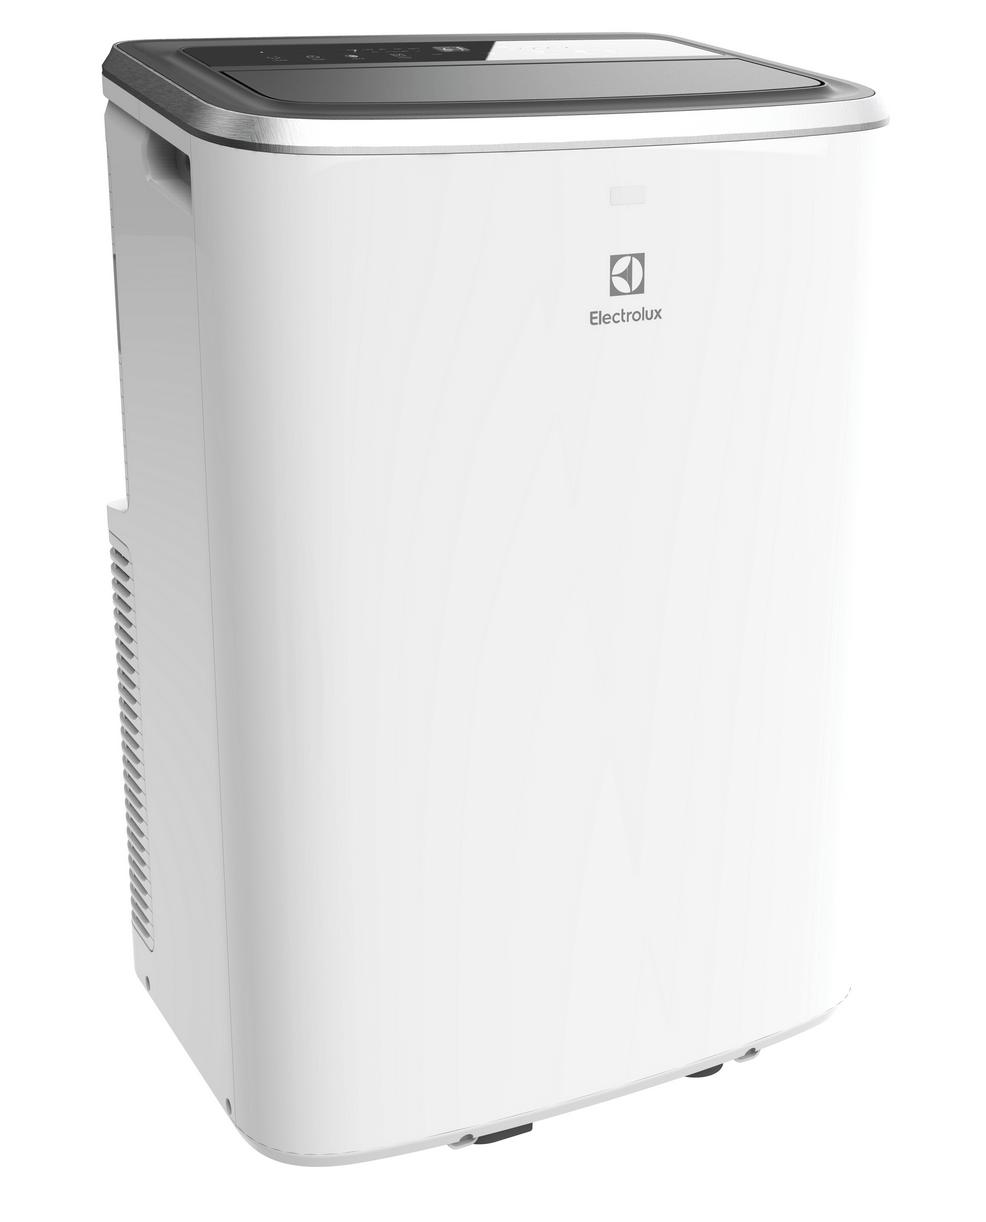 Bedste mobile aircondition lige nu – Electrolux EXP26U338CW